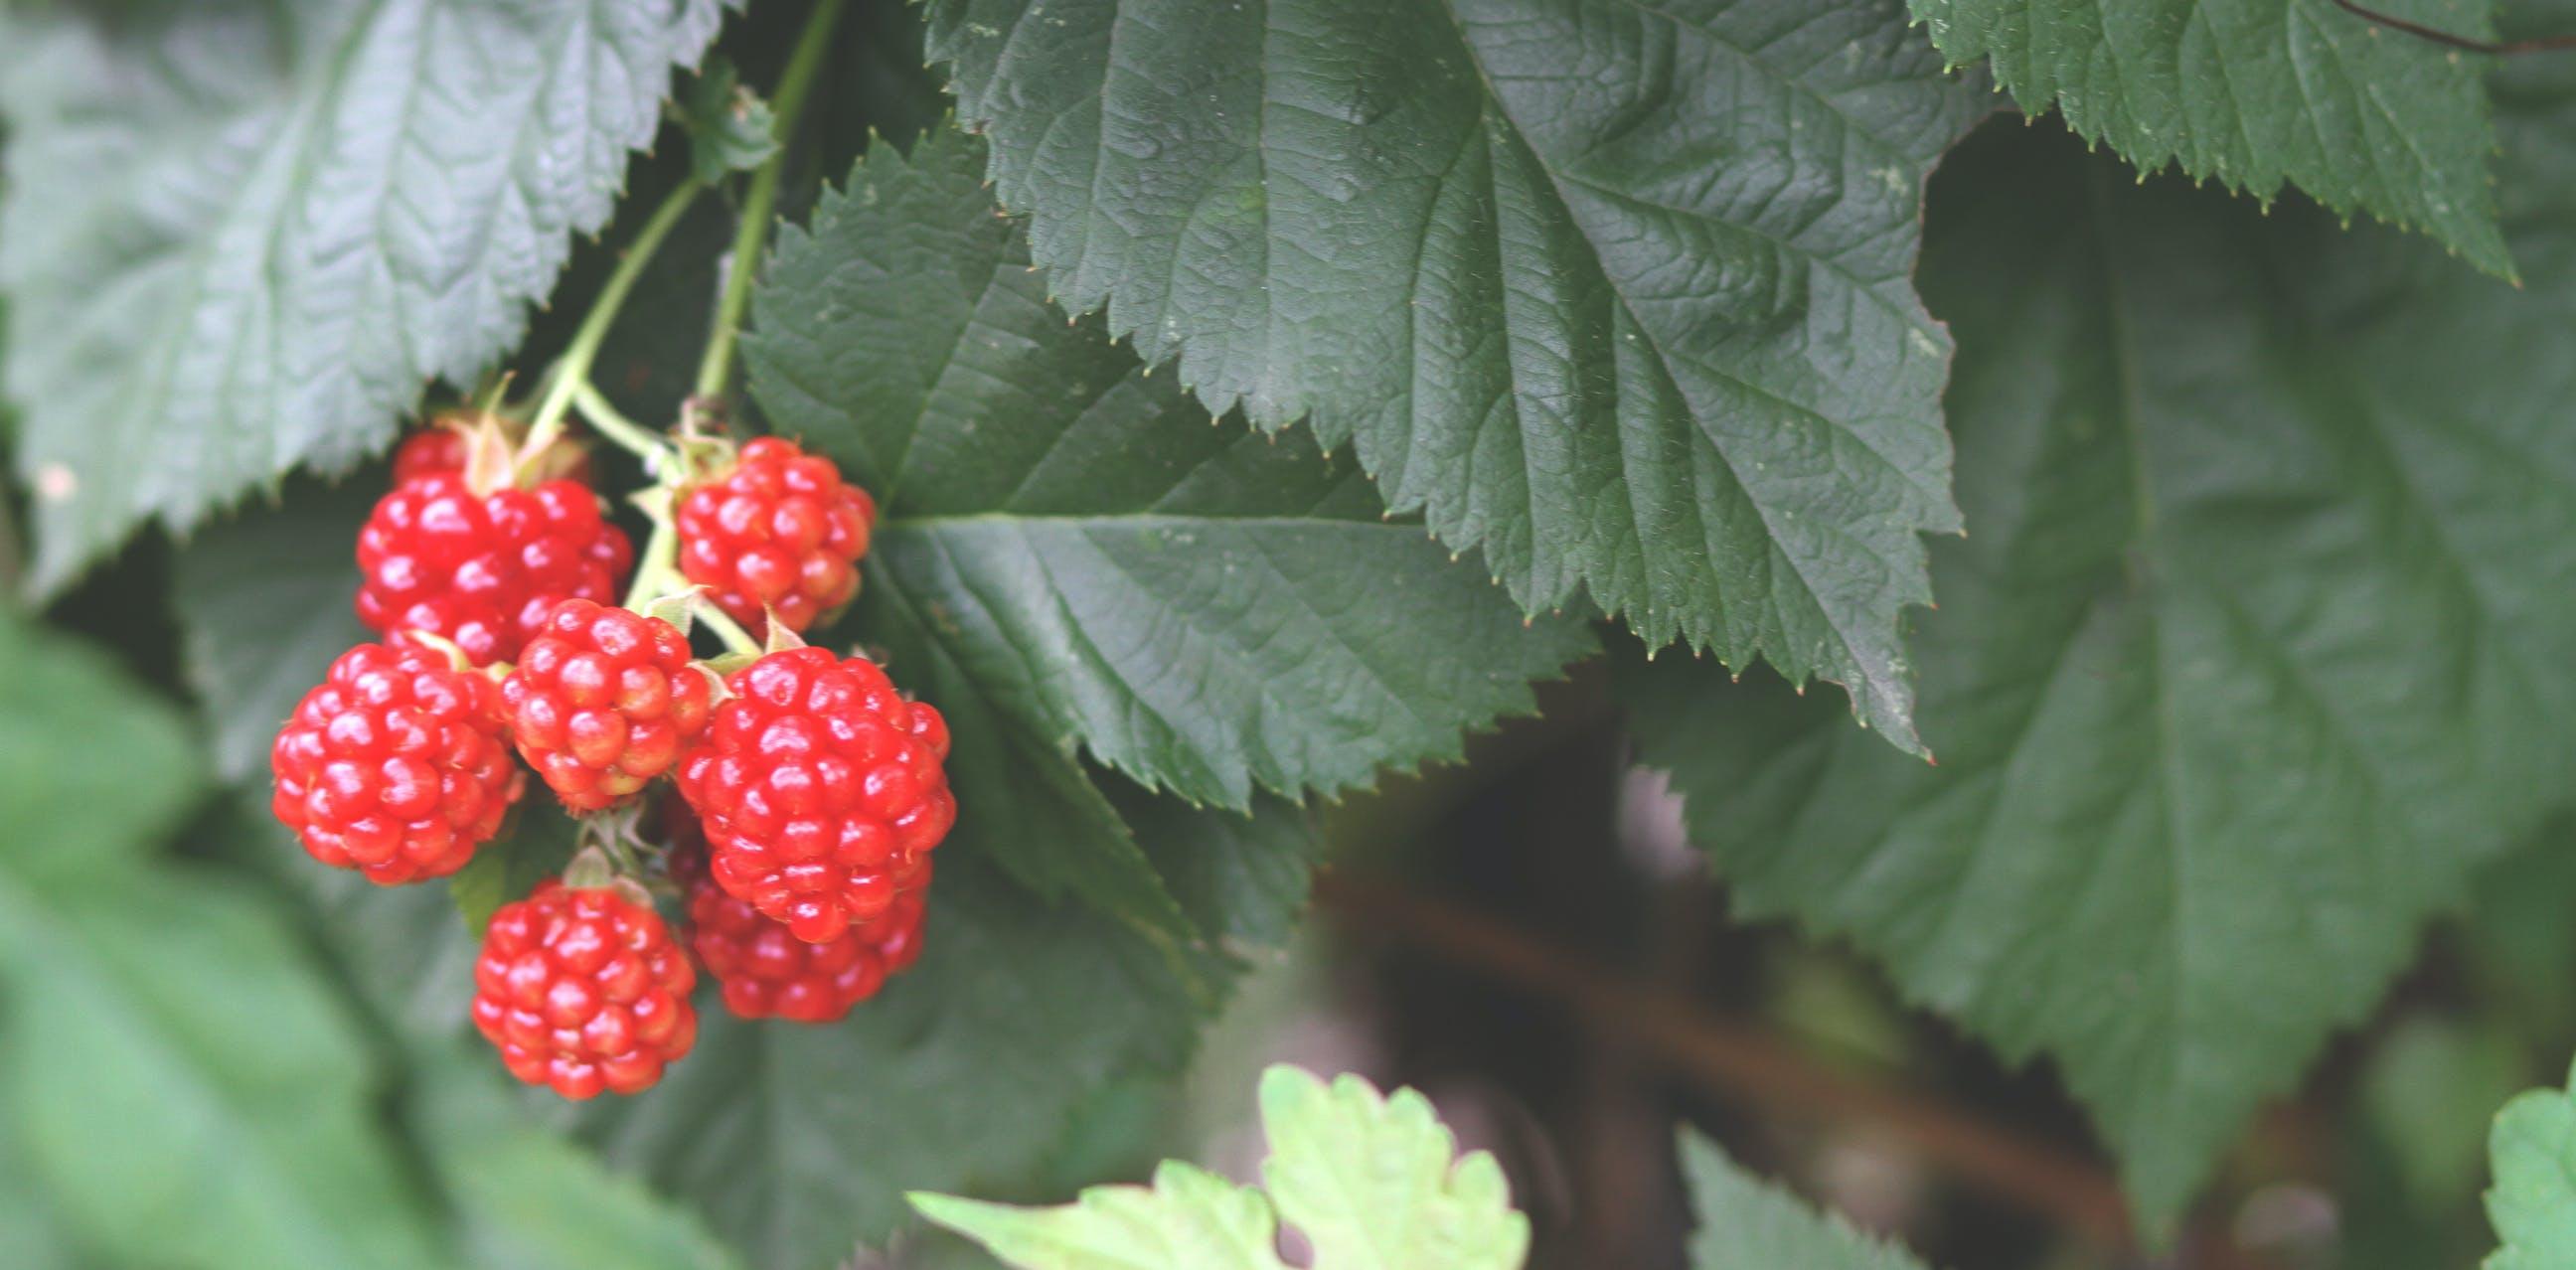 hedelmä, kasvi, marja